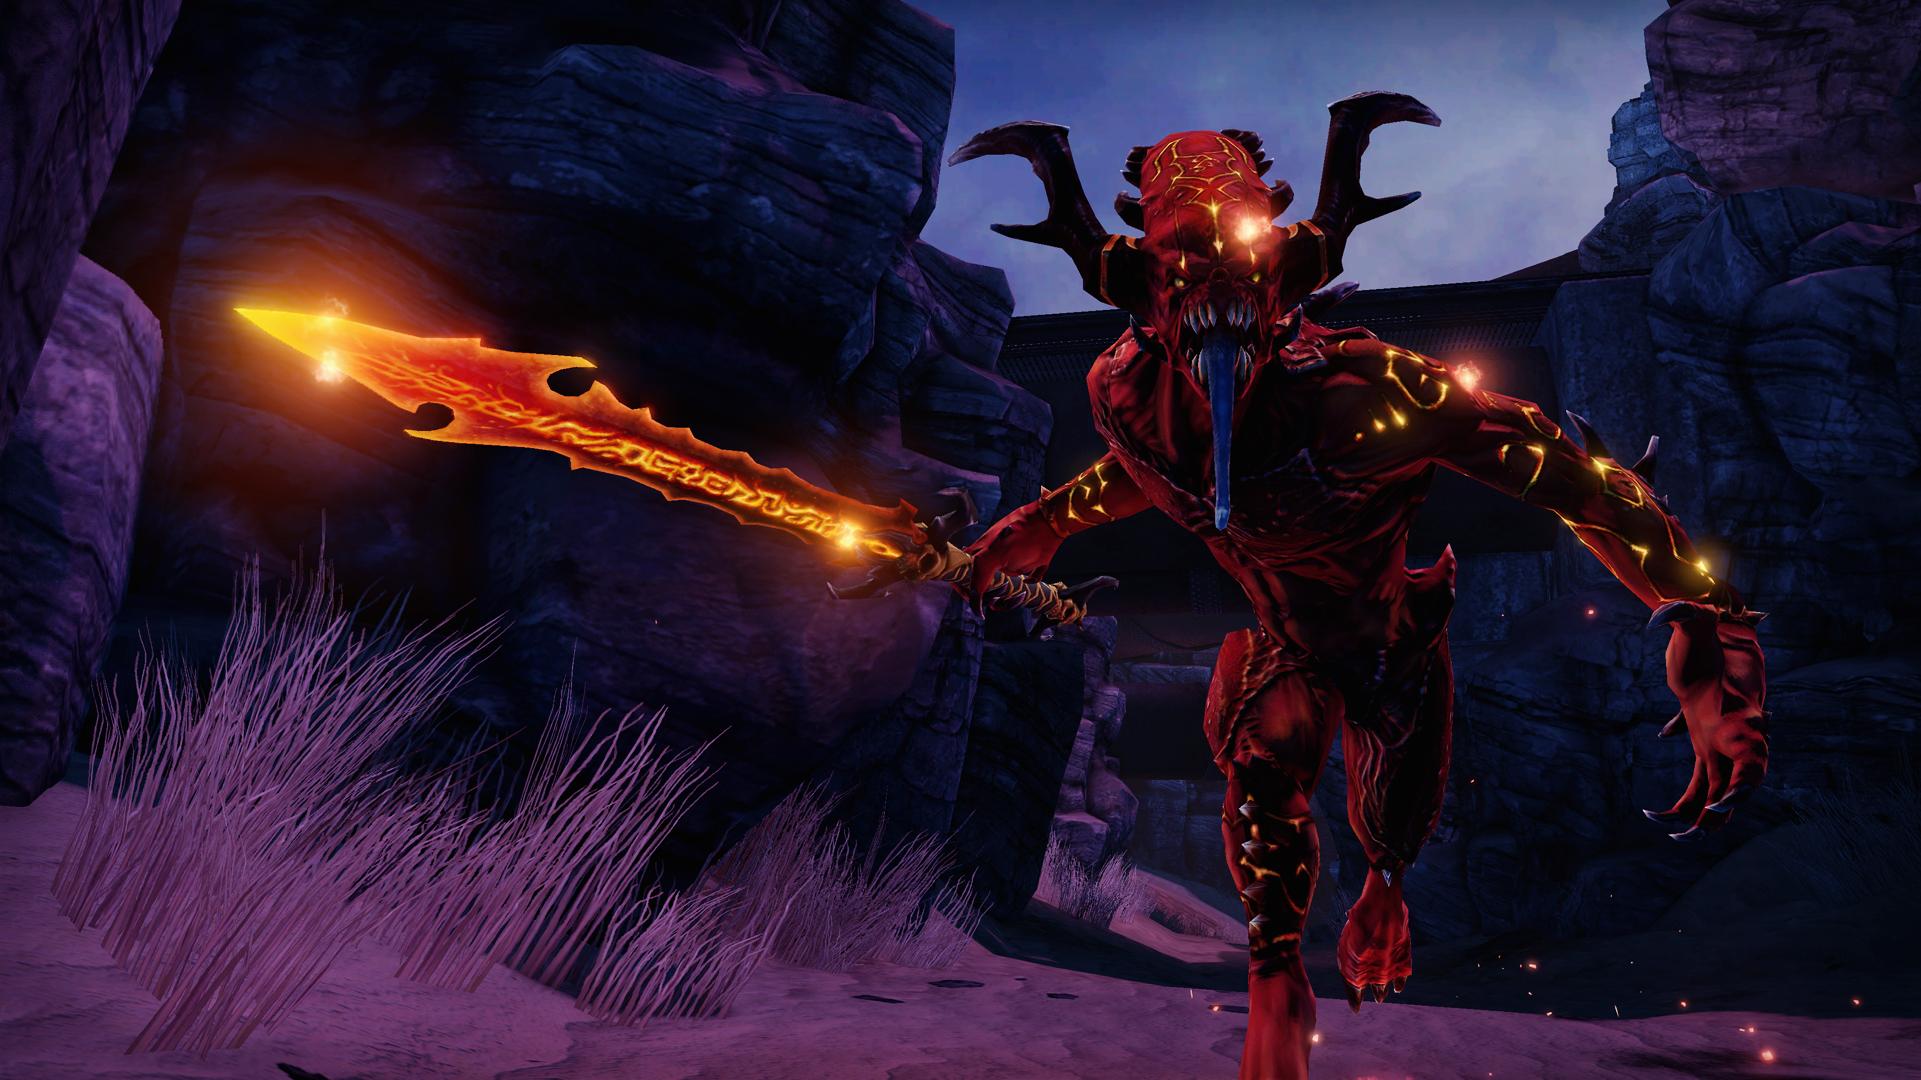 #020 - Blood Sword Chaos_bloodletter